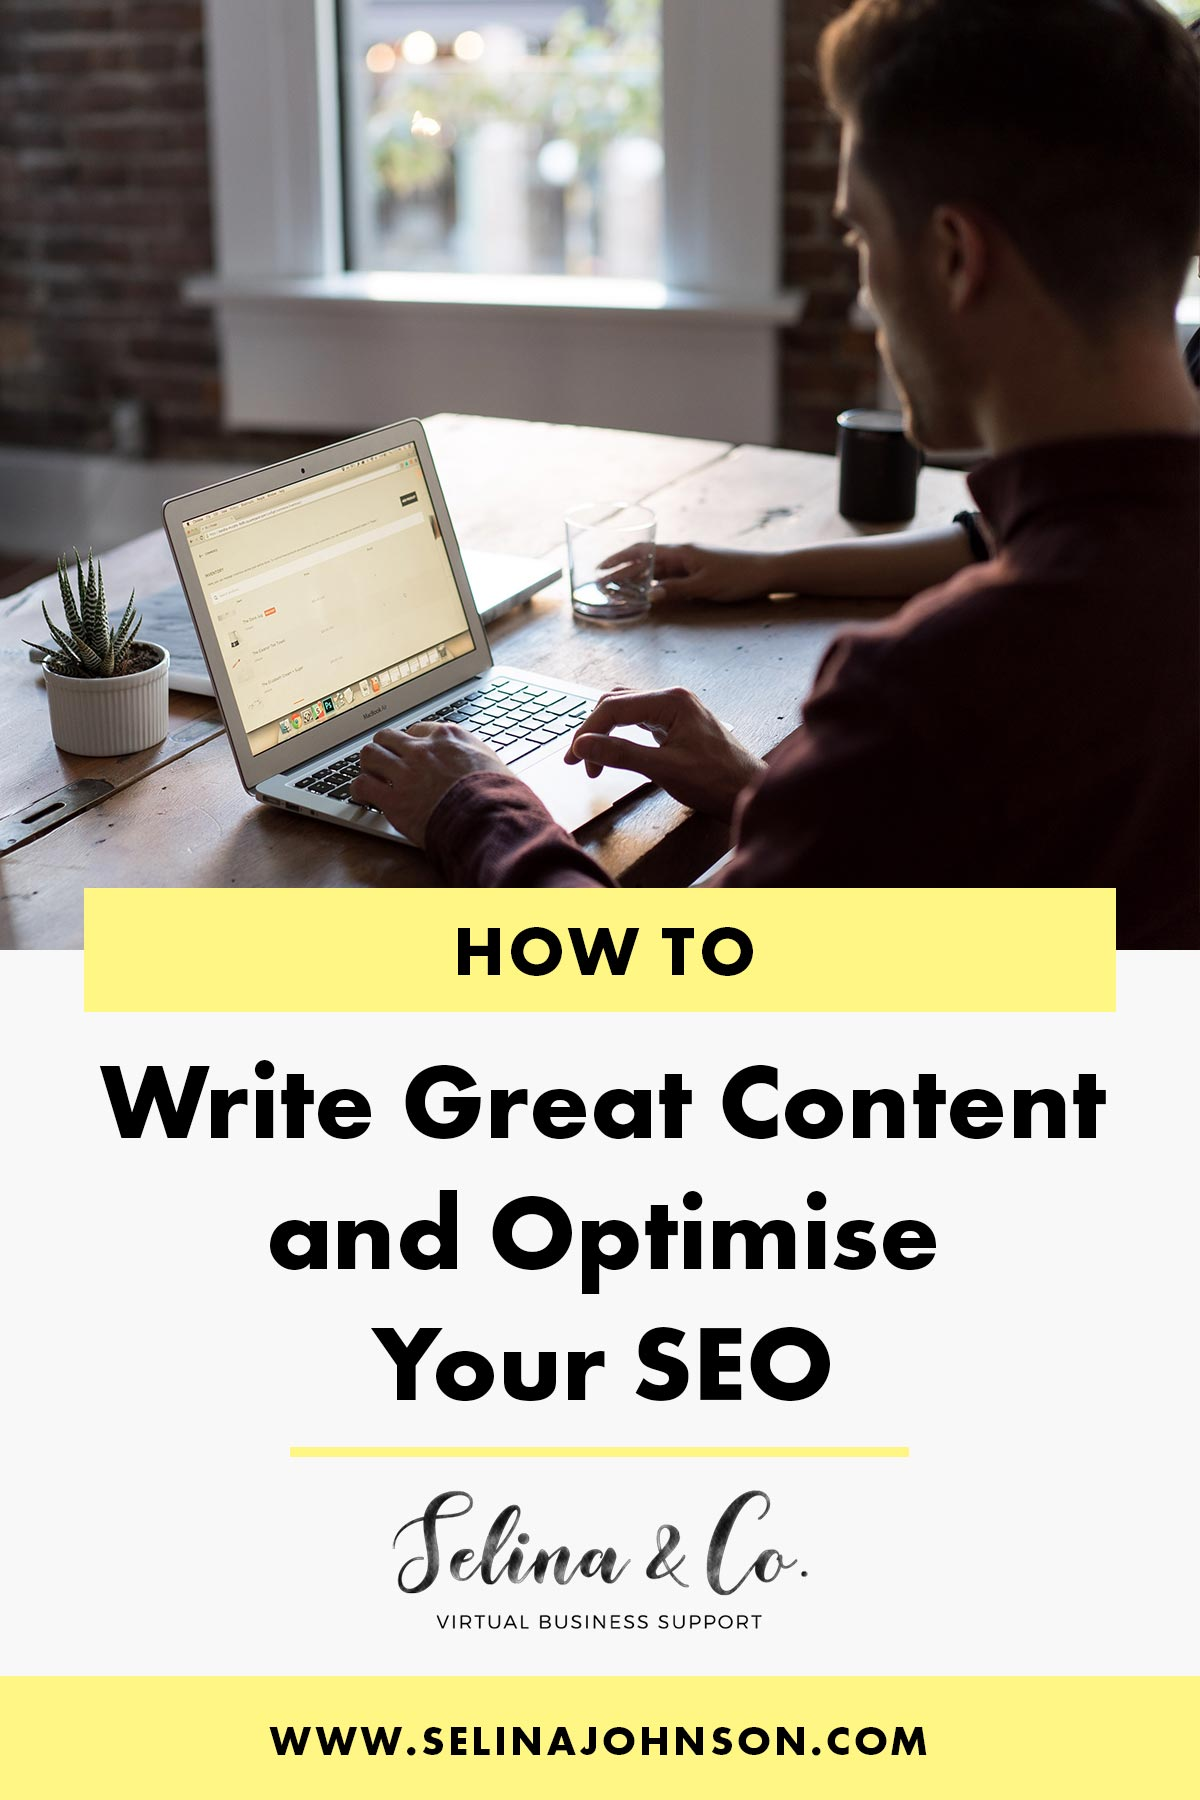 how-to-write-optimise-SEO.jpg